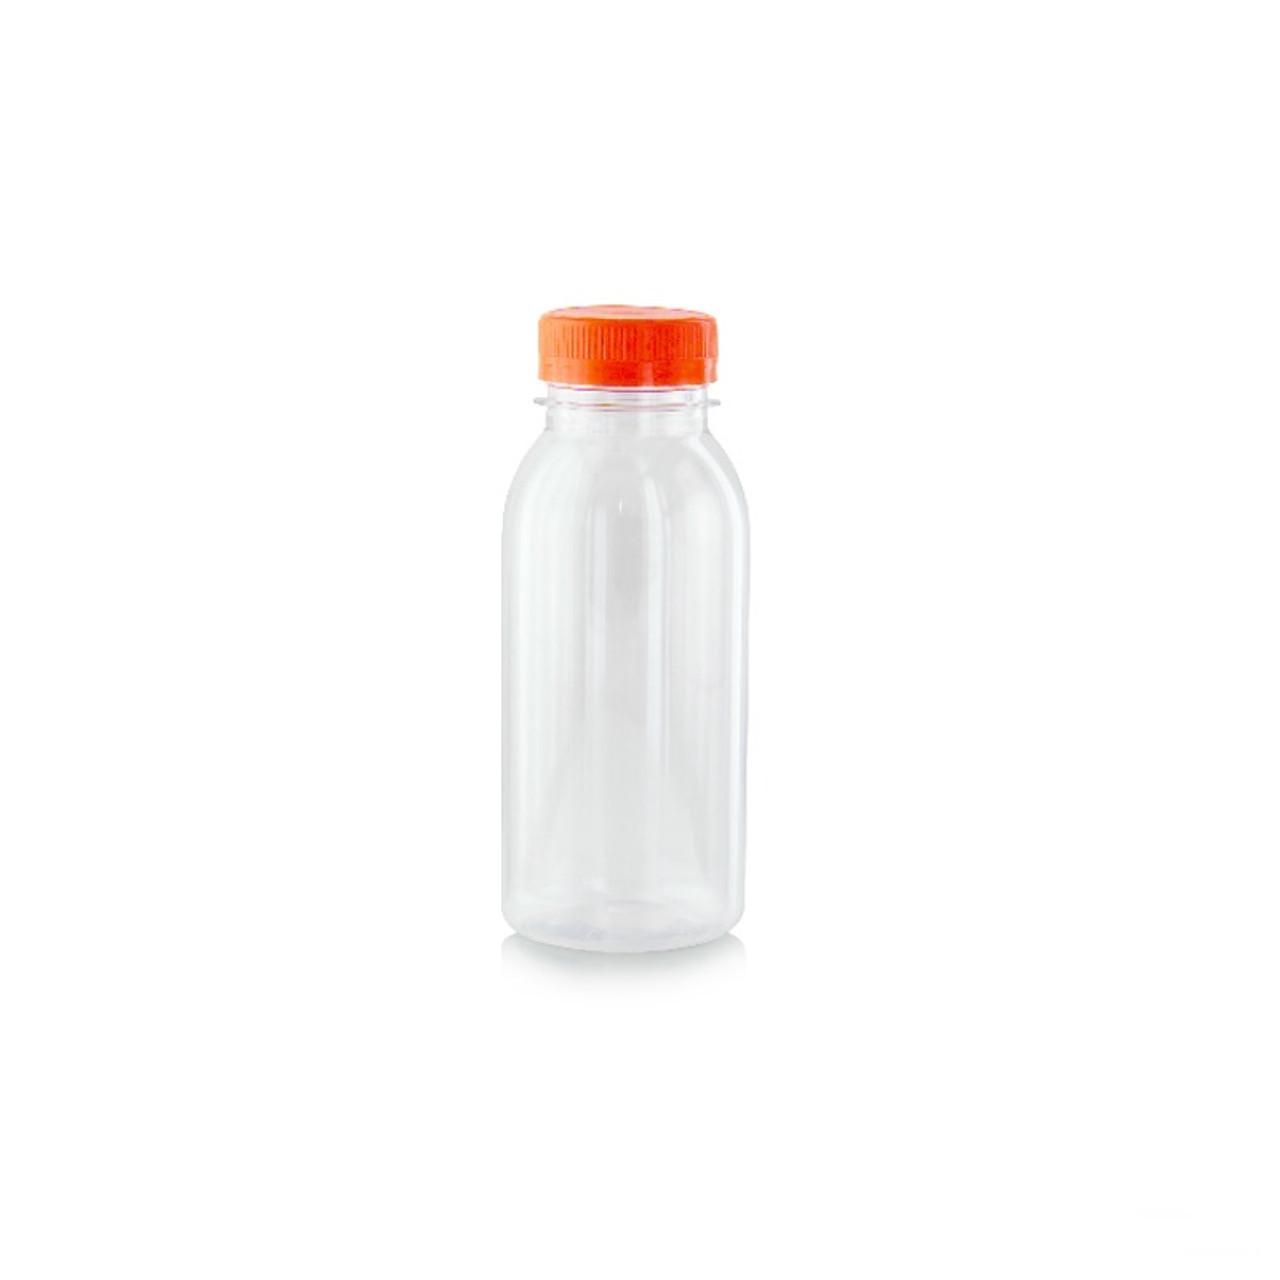 Round Pet Bottle With Orange Cap -7.8oz